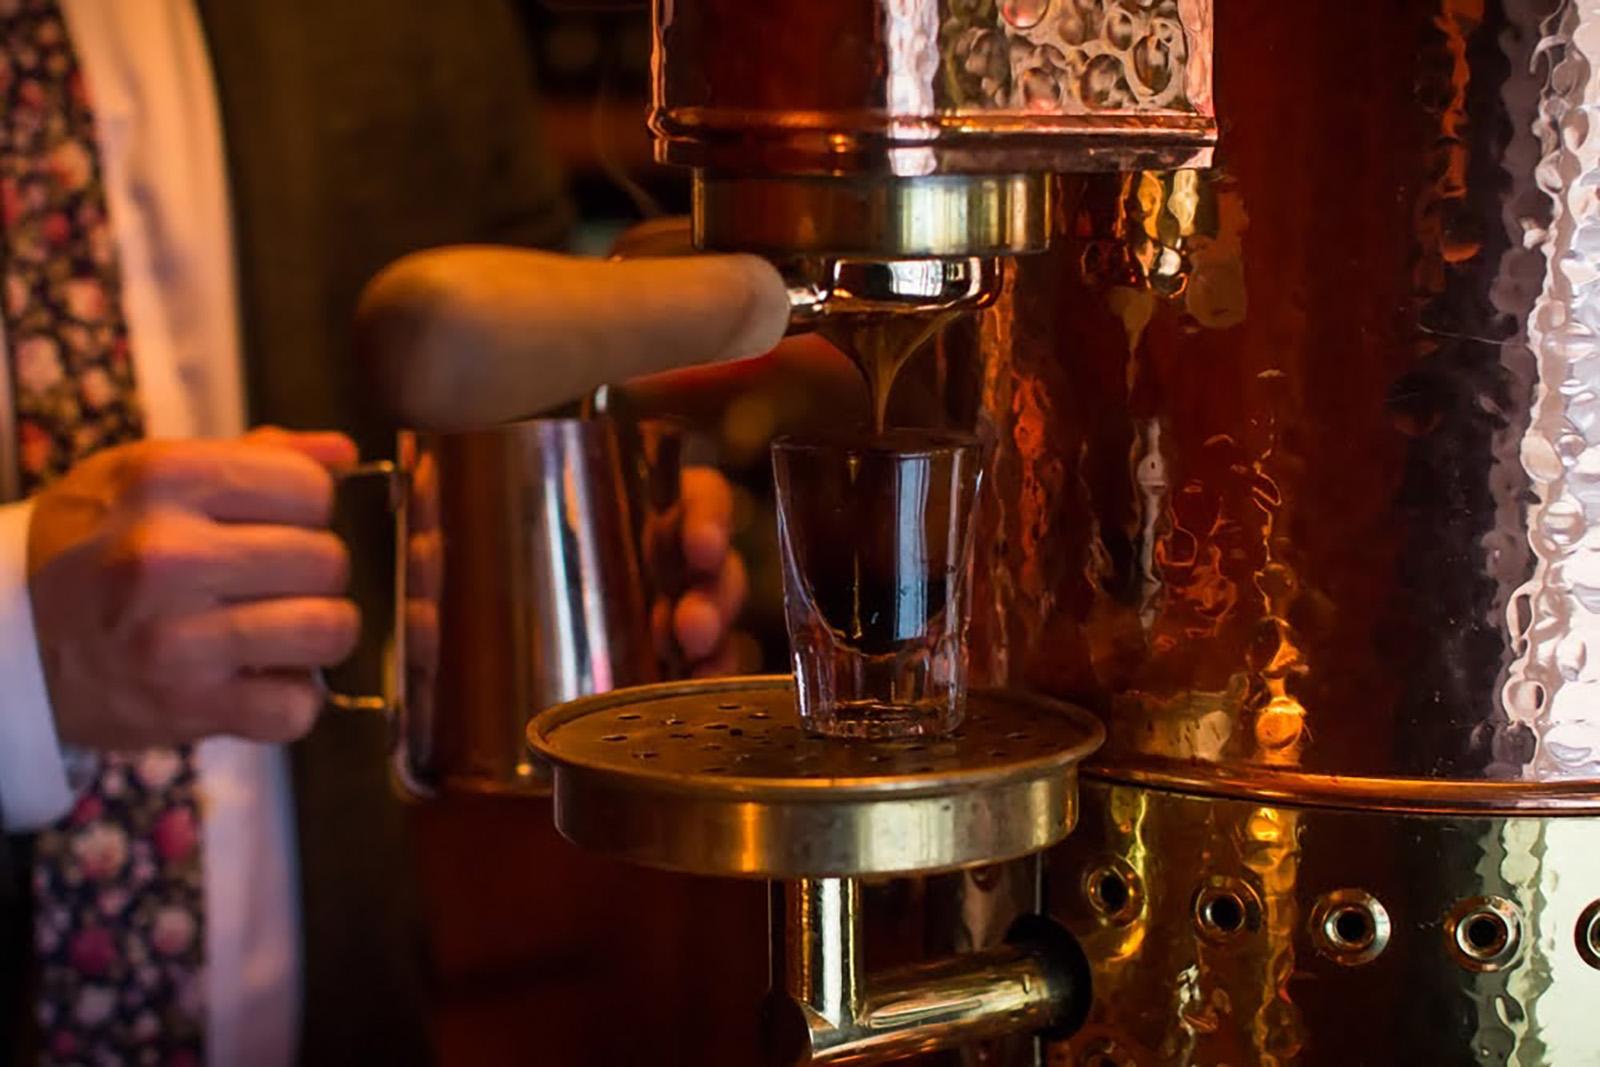 Steamed Espresso